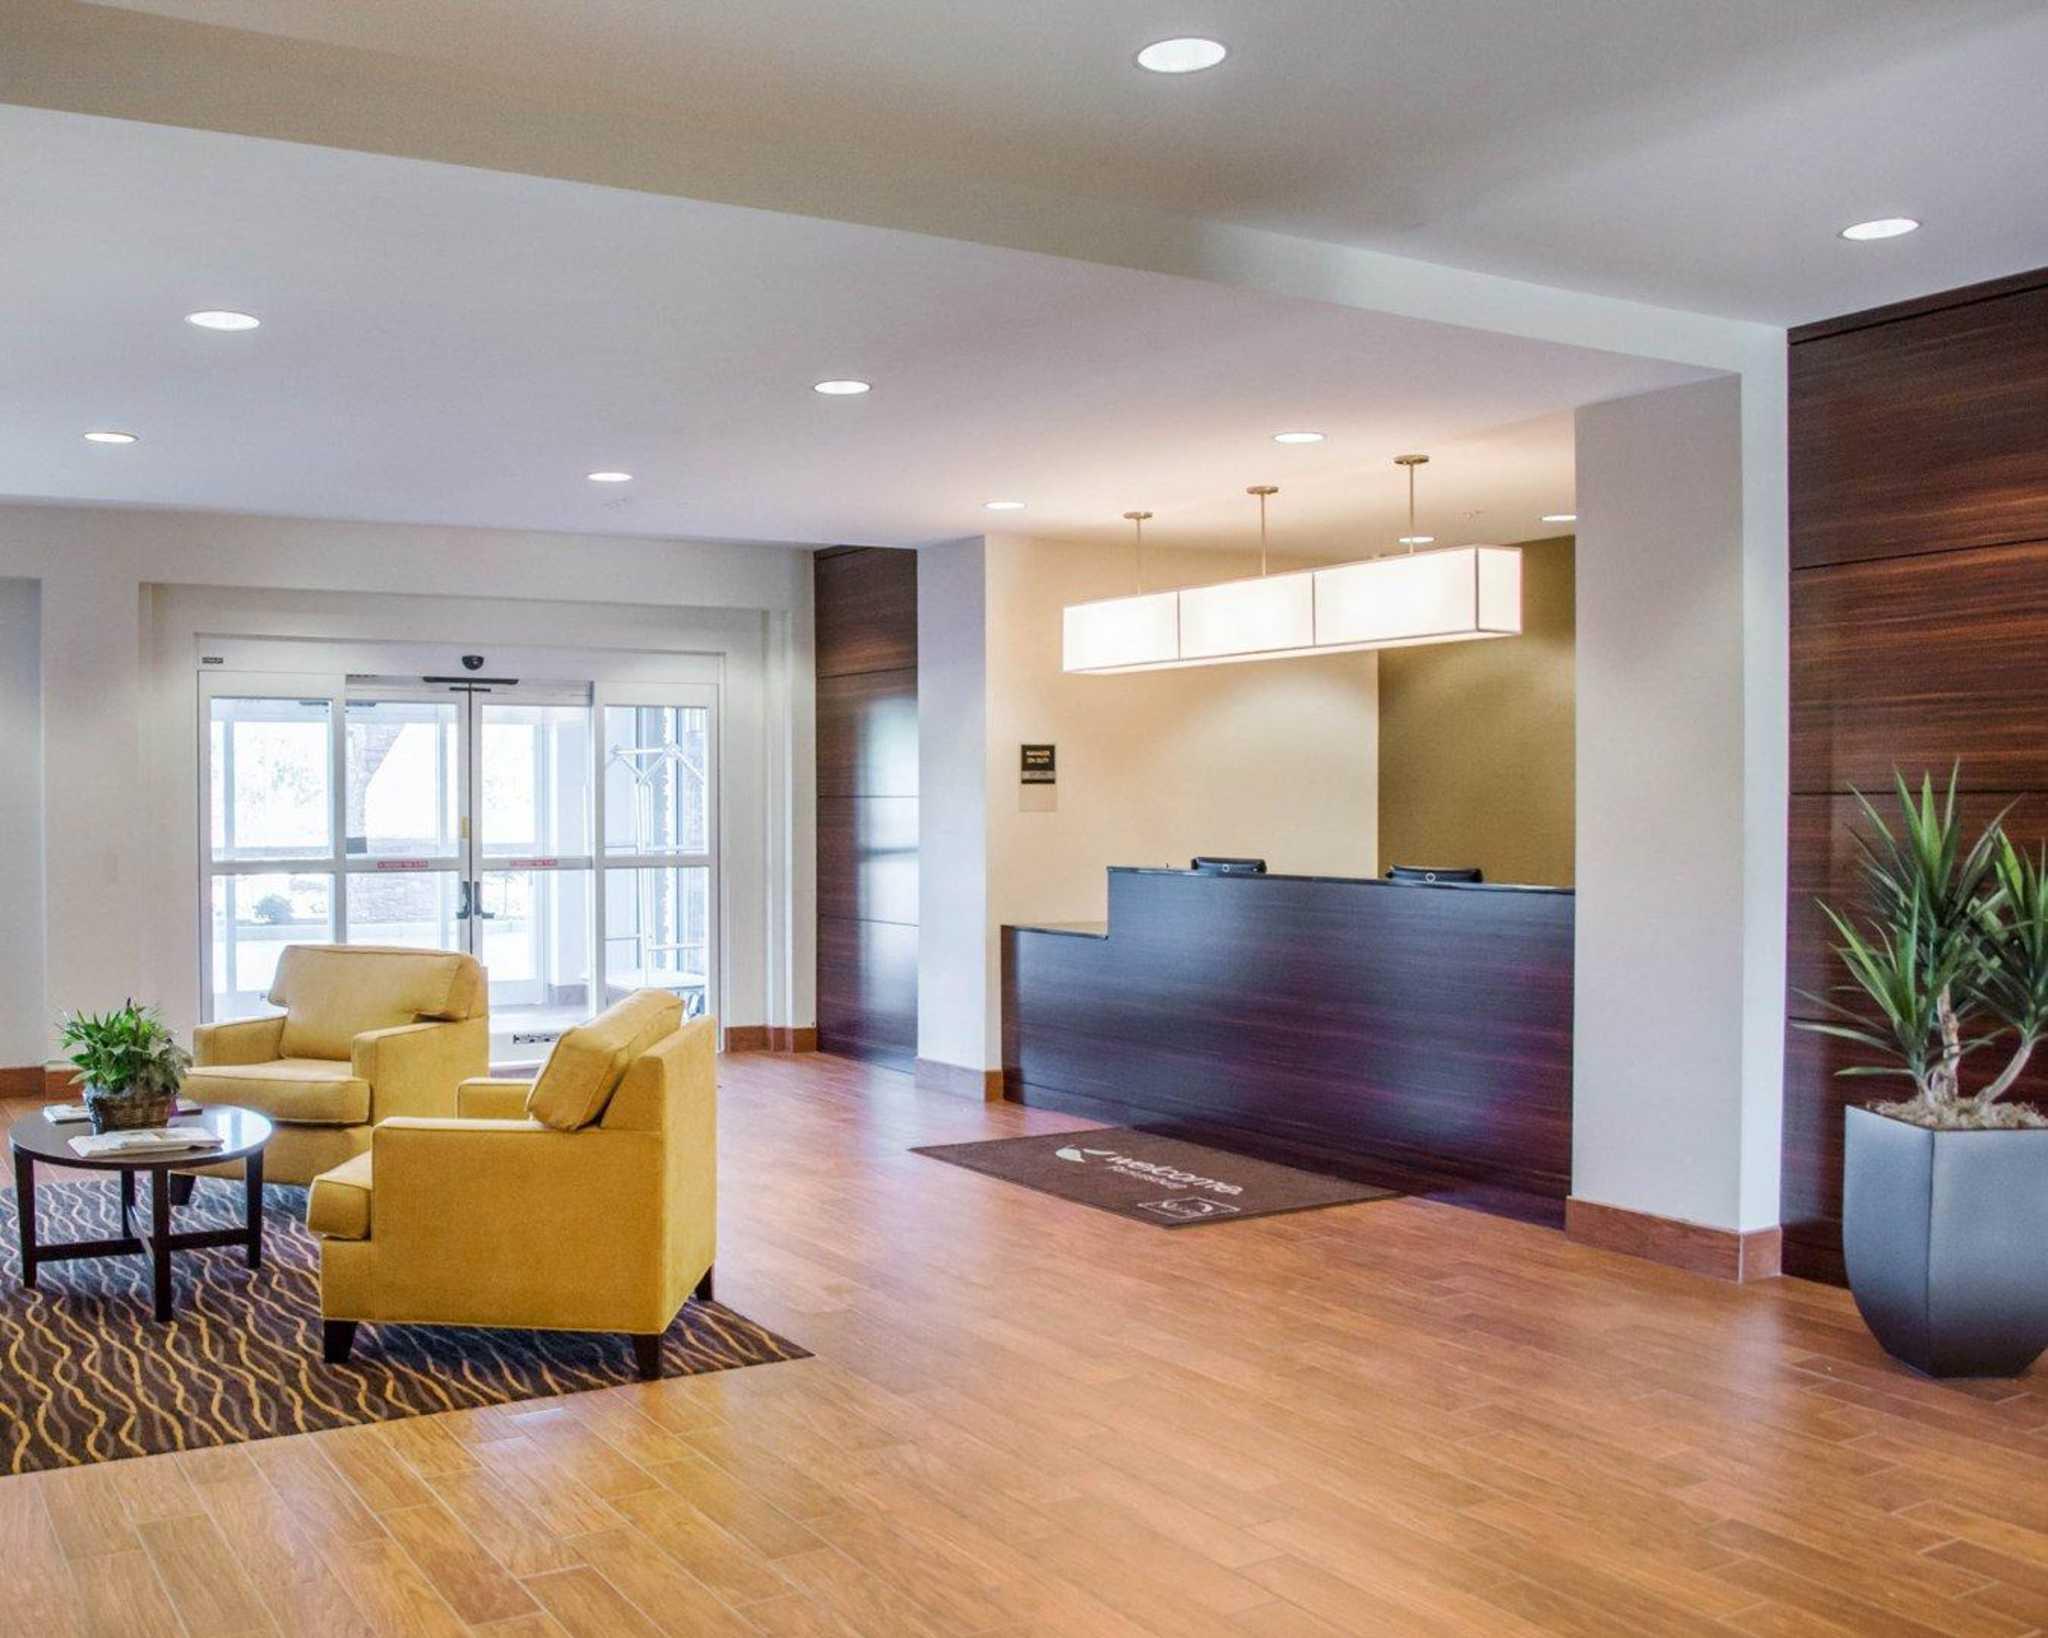 Sleep Inn & Suites Parkersburg-Marietta image 5